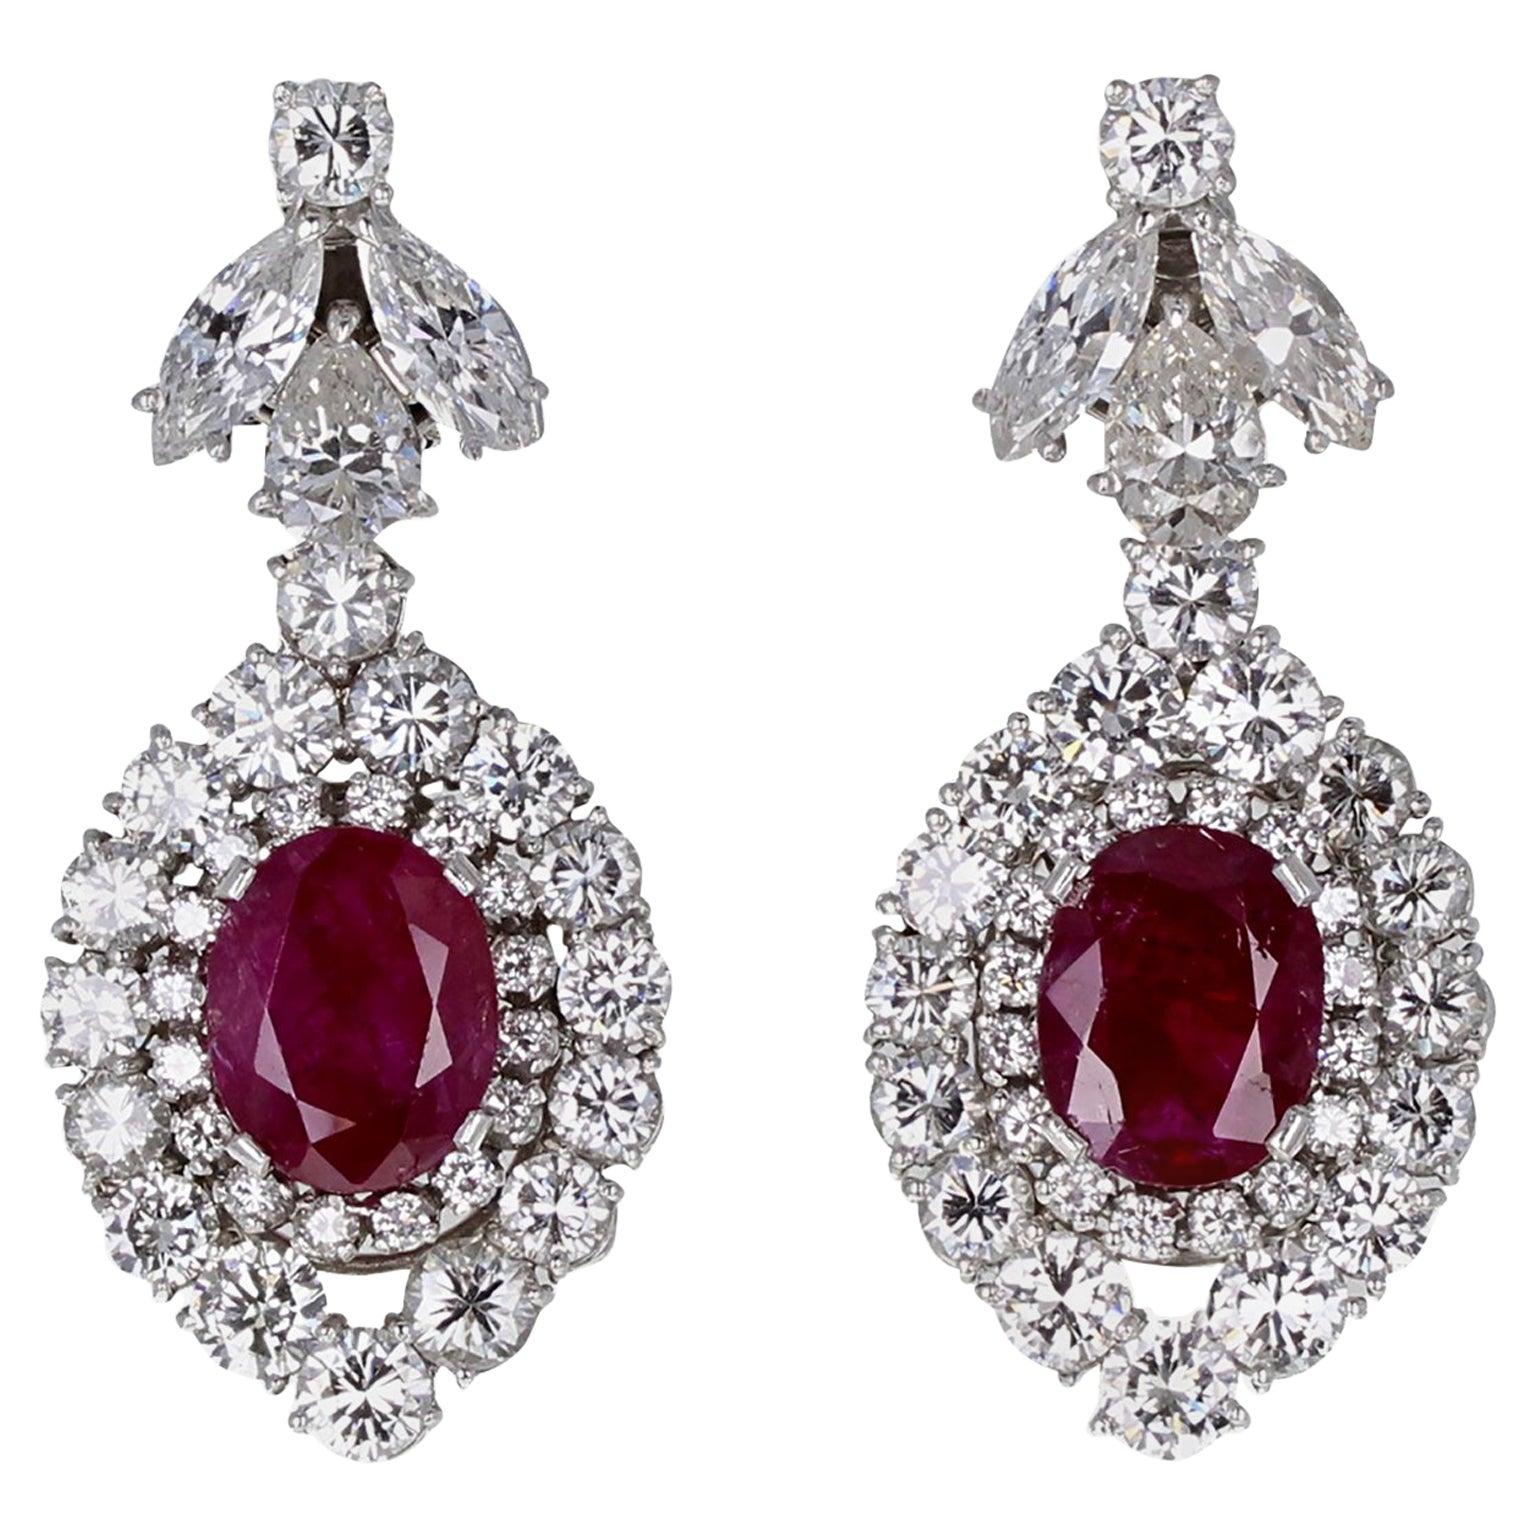 Untreated Burma Ruby Diamond Pear Shaped Cluster Ear Clips